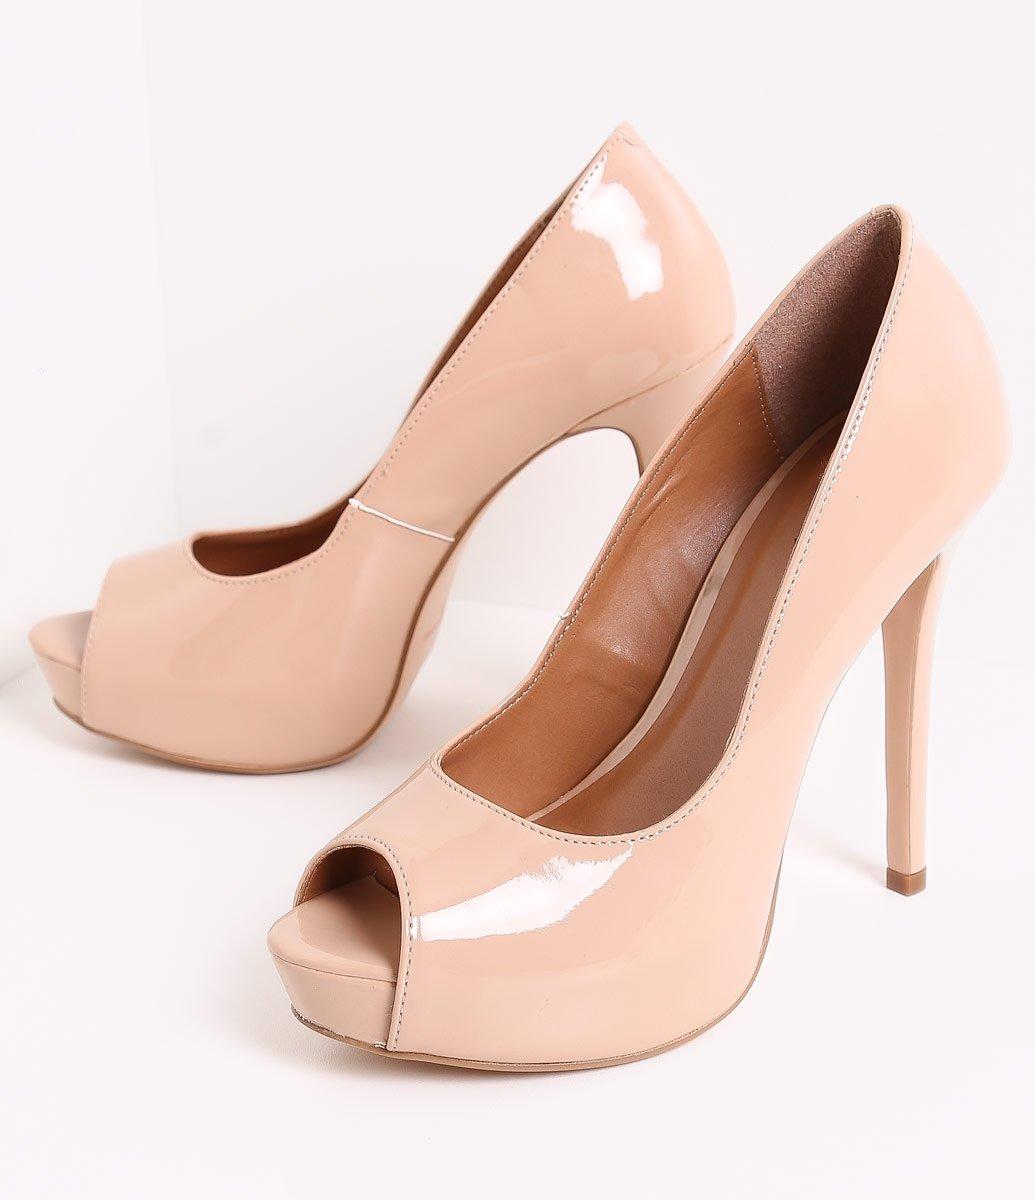 4df2306da8 Menor preço em Sapato Feminino Peep Toe Envernizado Satinato